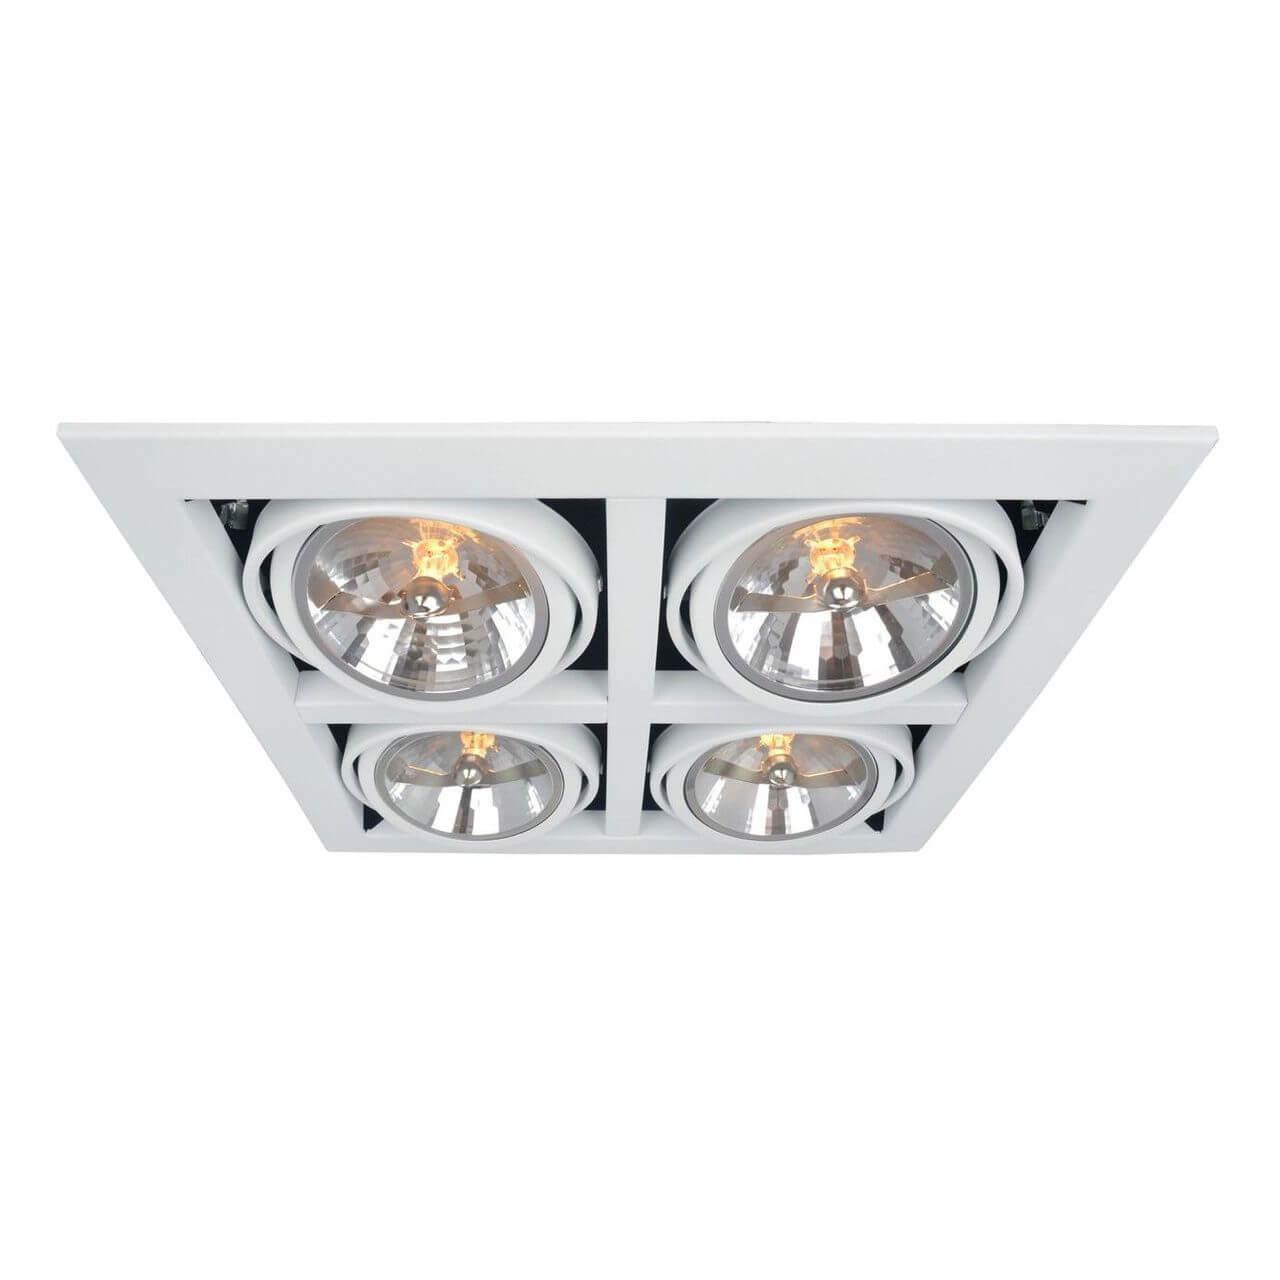 Светильник Arte Lamp A5935PL-4WH Cardani White цена 2017